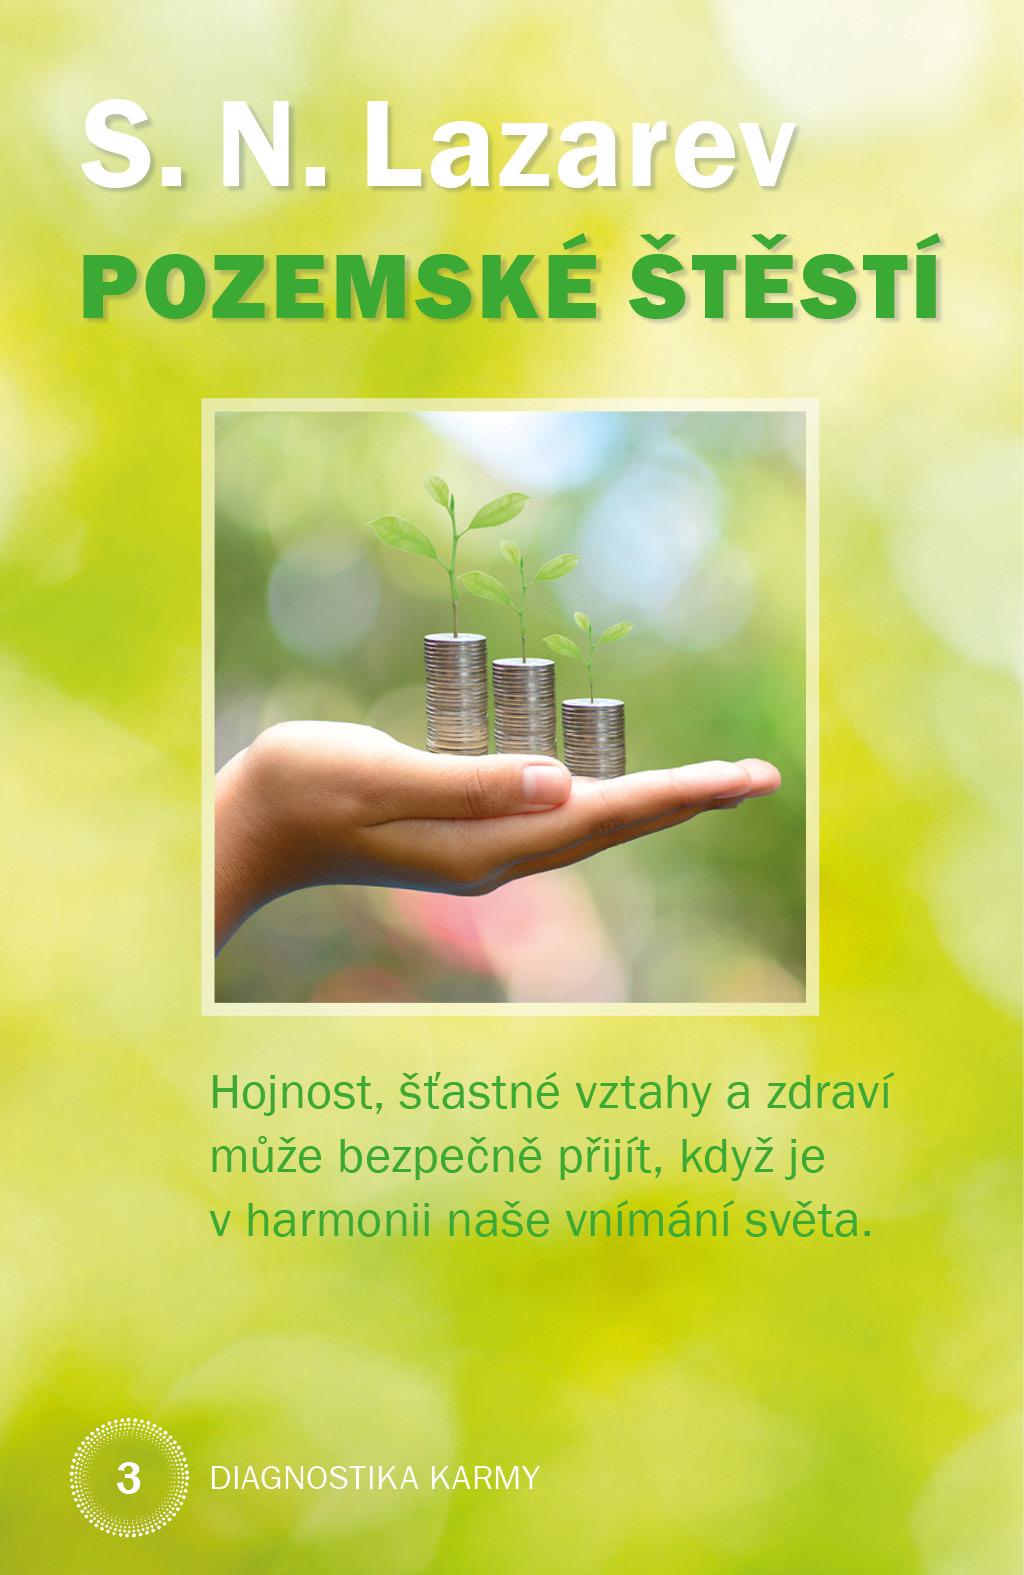 Pozemske_stesti_cover_3